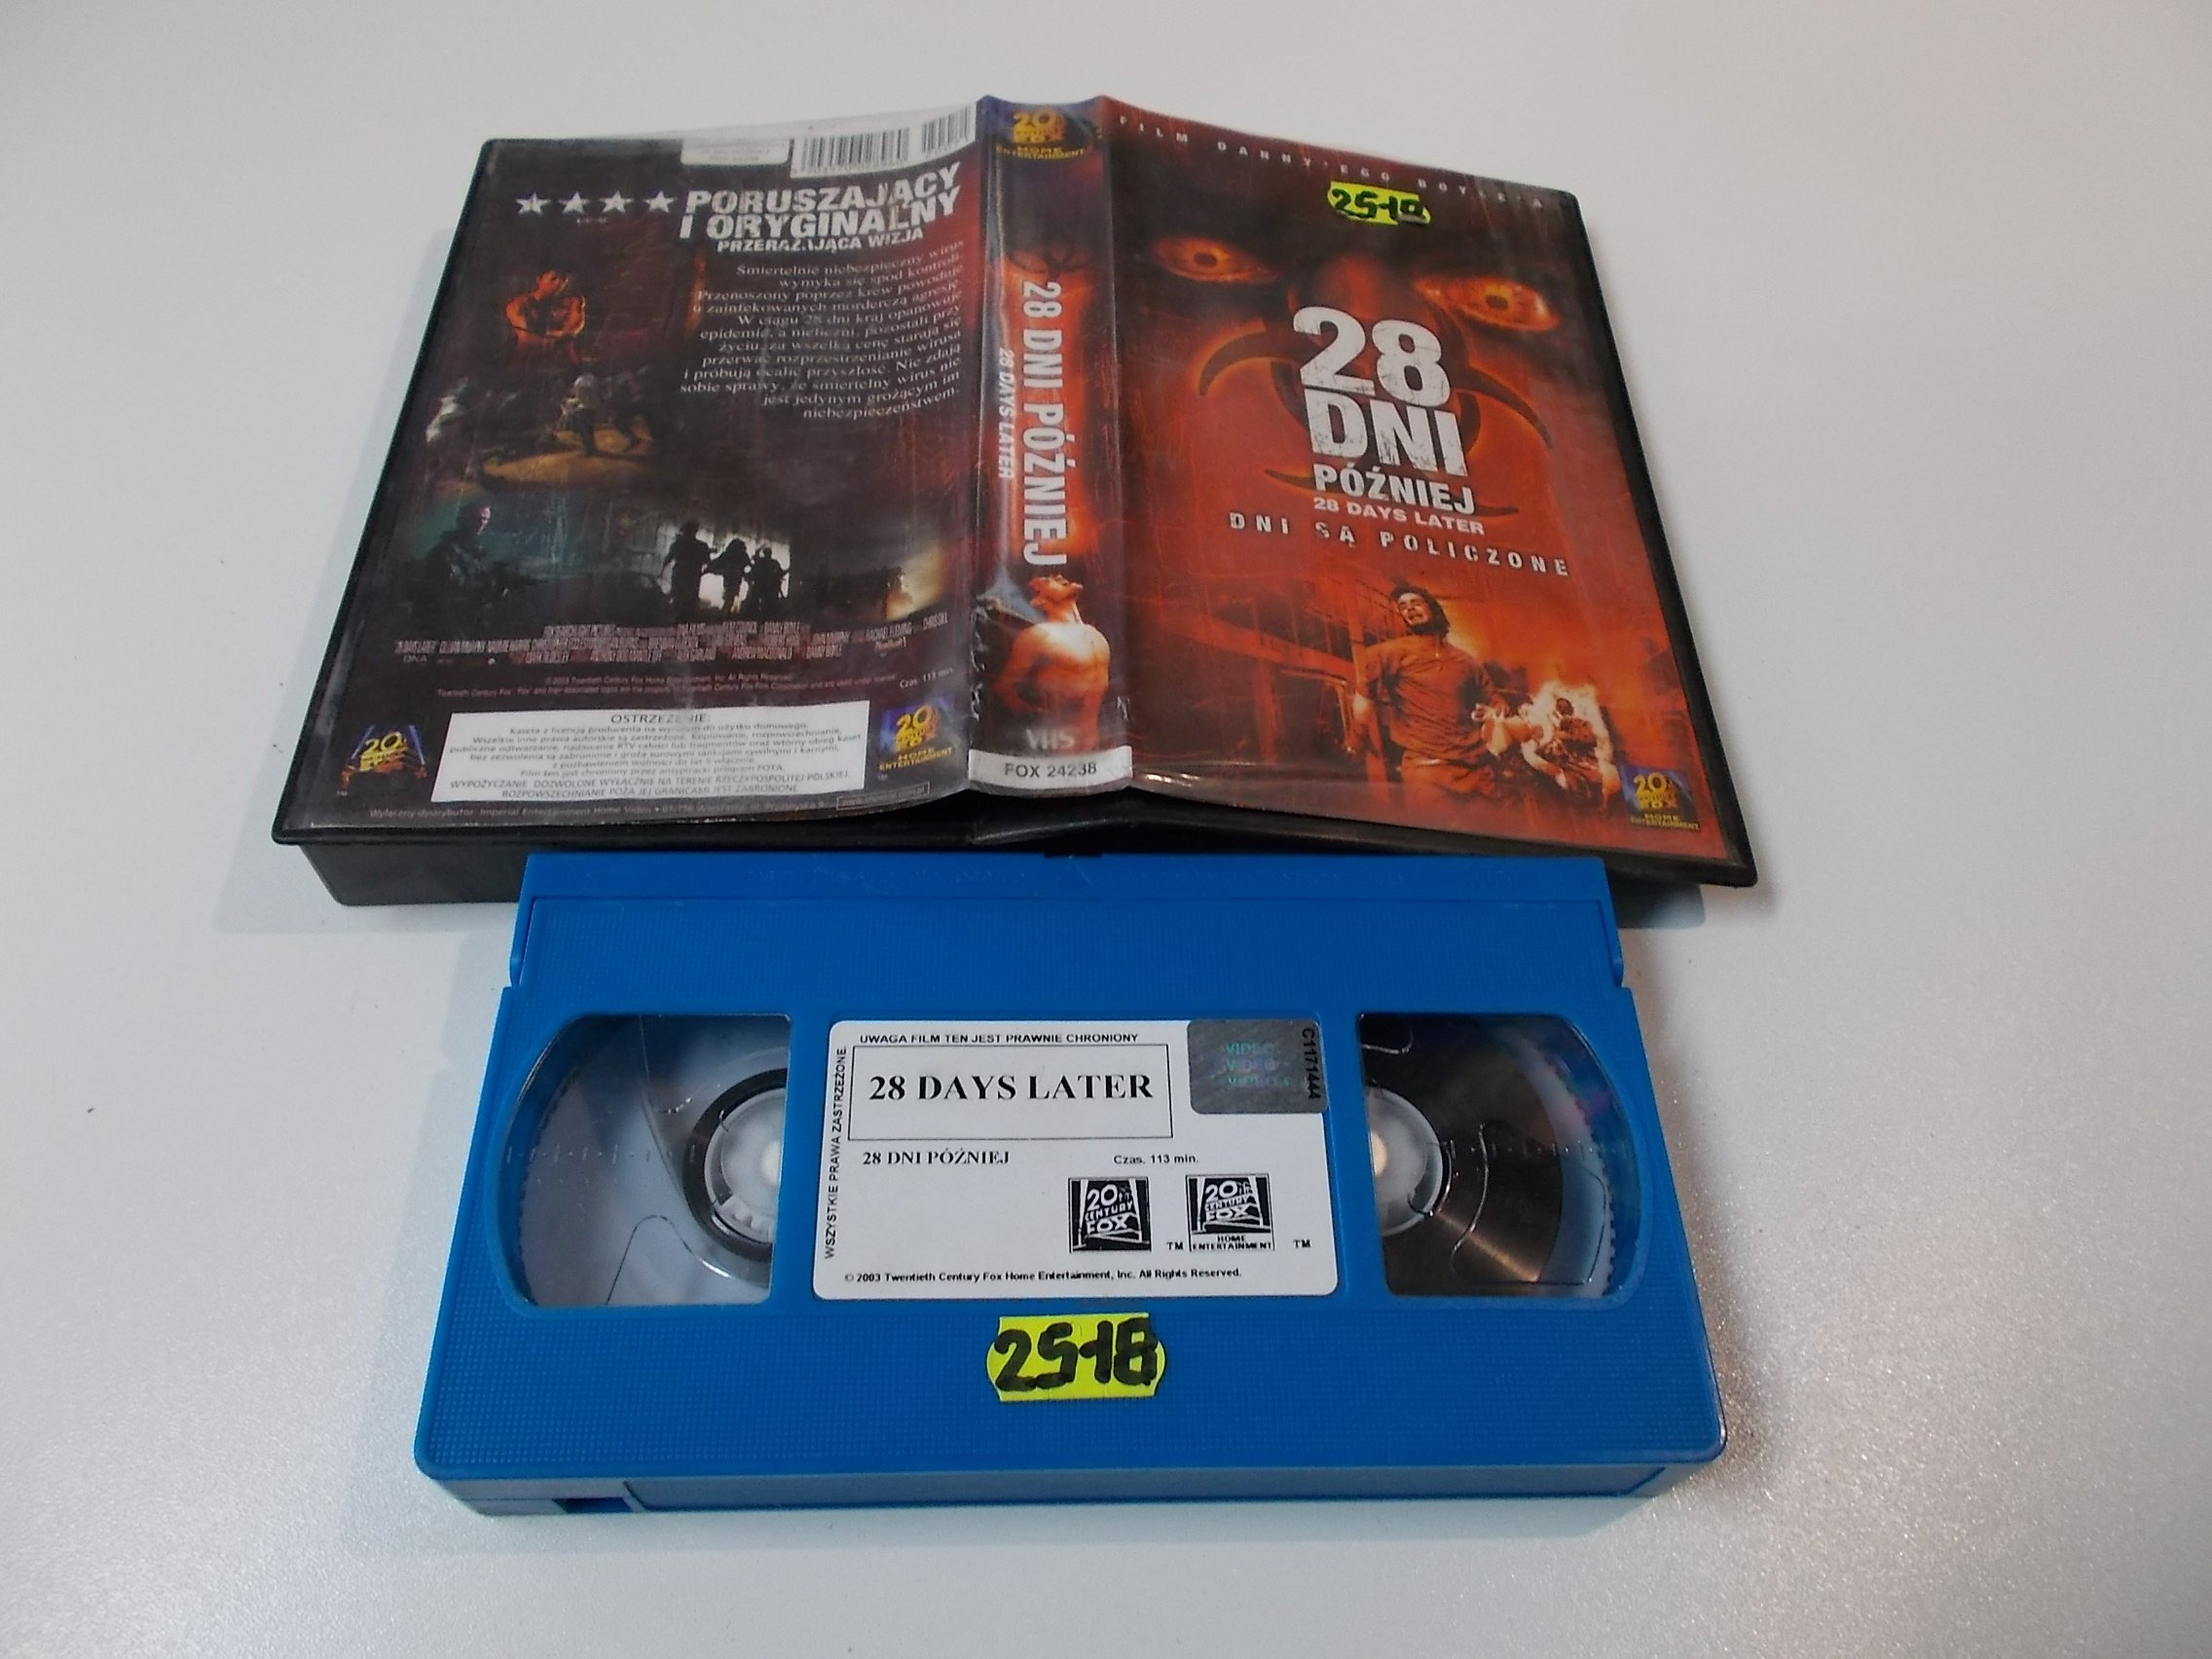 28 DNI PÓŹNIEJ - Kaseta Video VHS - Opole 1584